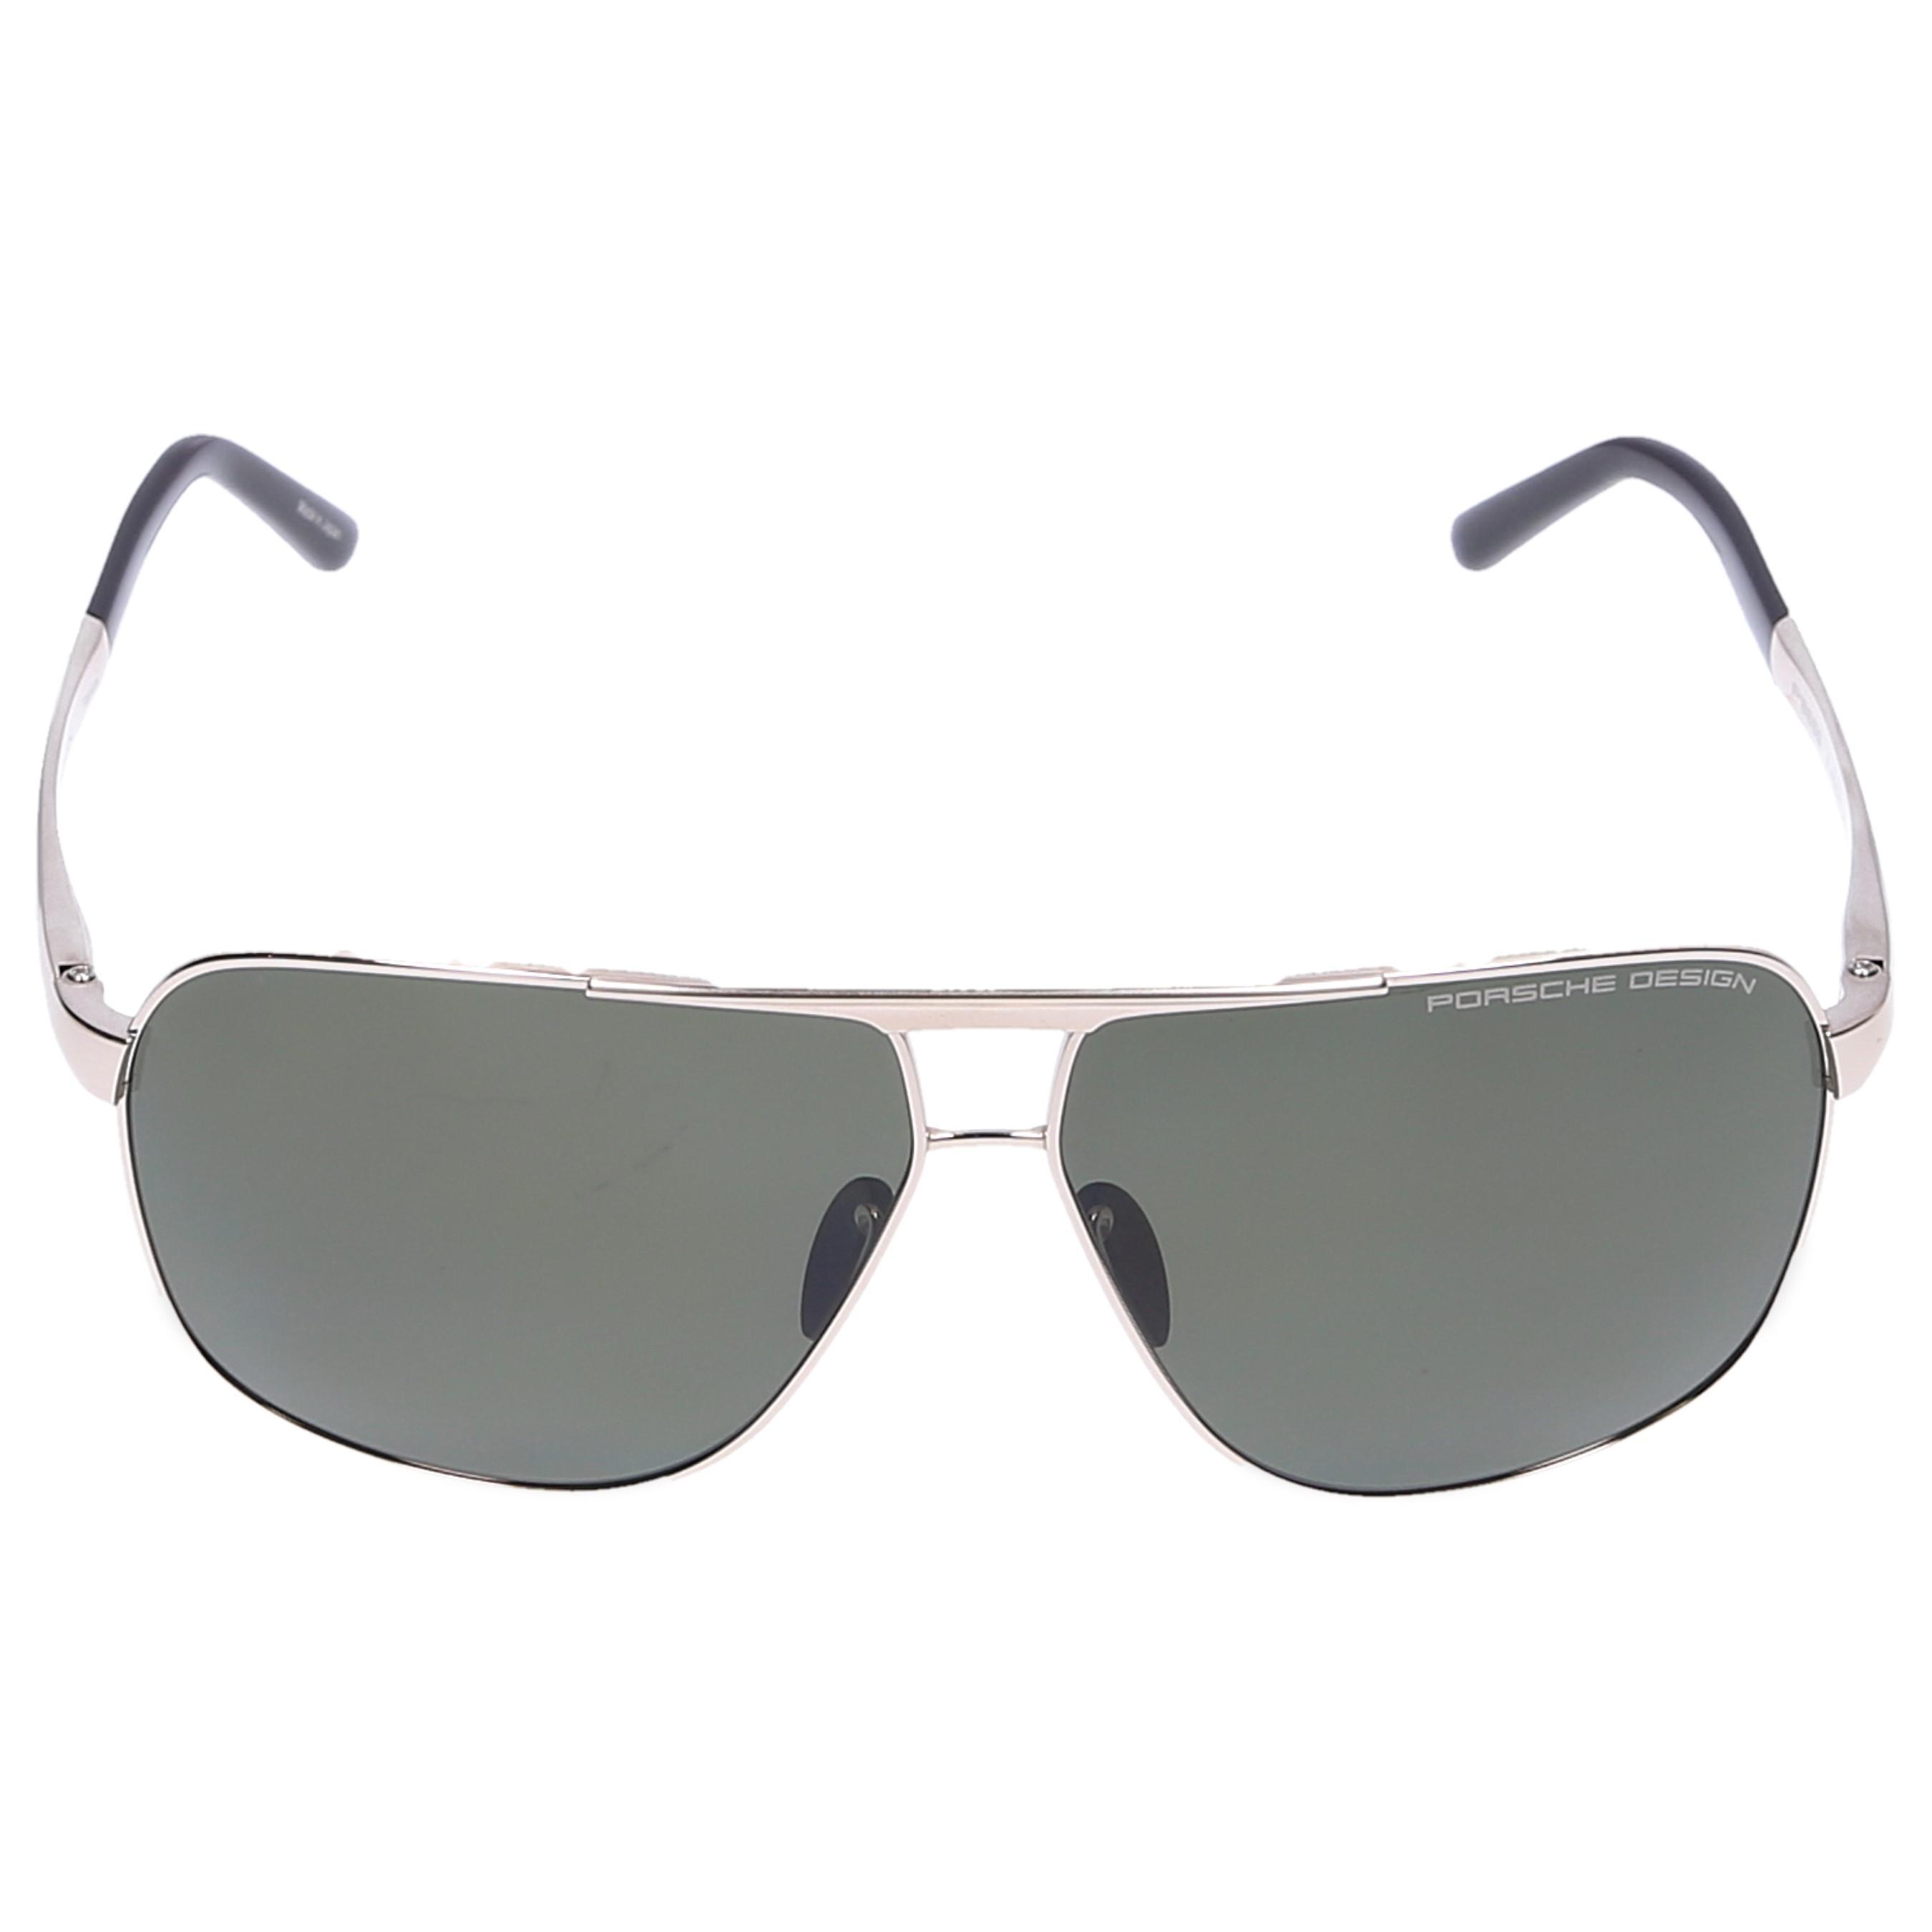 9a6a90f11e2 Porsche Design - Metallic Sunglasses Aviator 8665 Titanium Gold Black for  Men - Lyst. View fullscreen